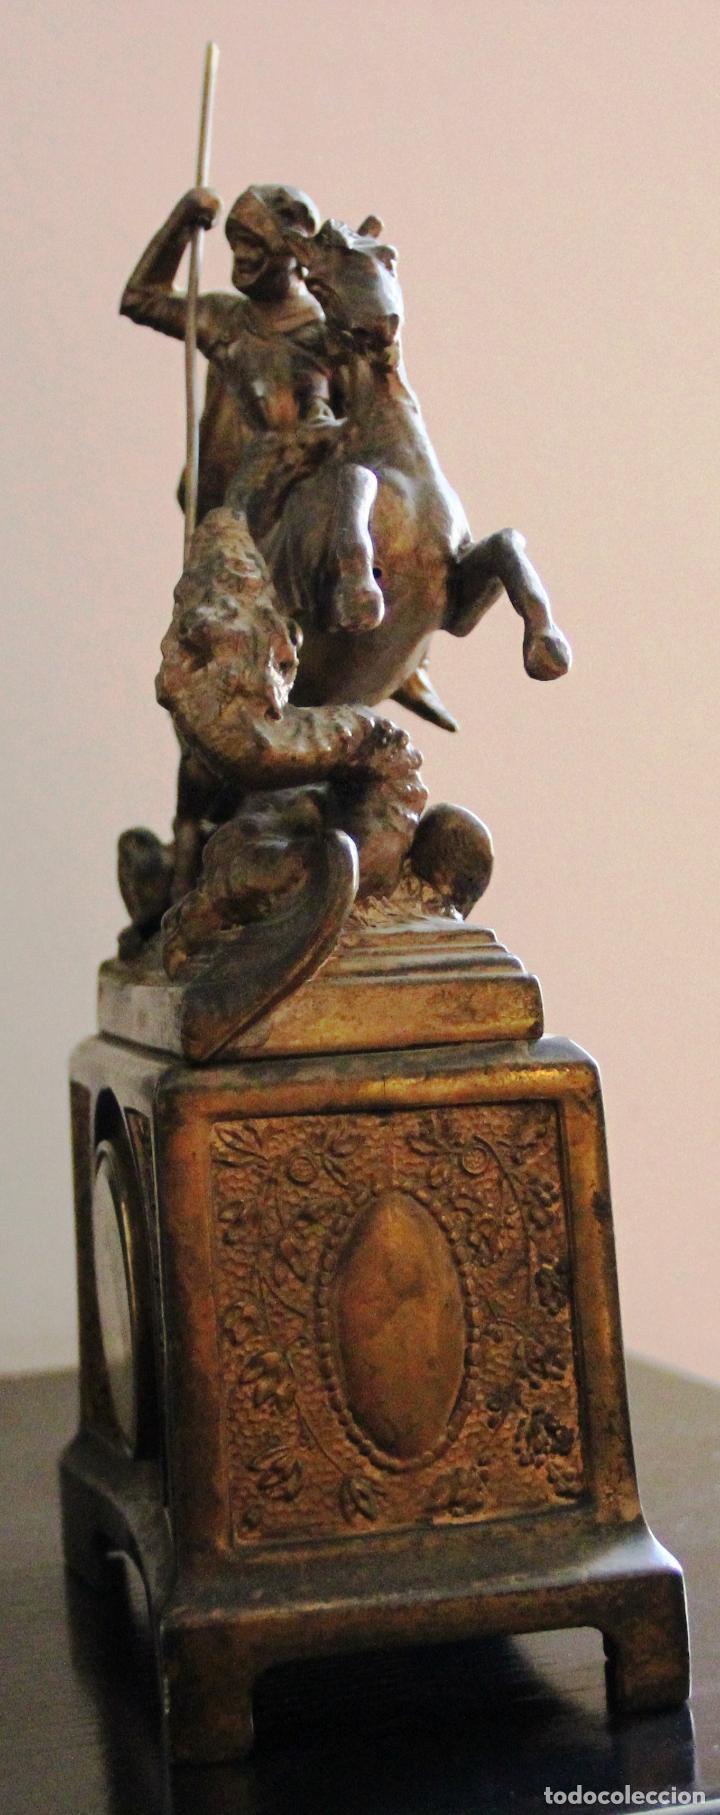 Relojes de carga manual: ANTIGUO RELOJ SANT JORDI Y EL DRAGON - Foto 16 - 156536490